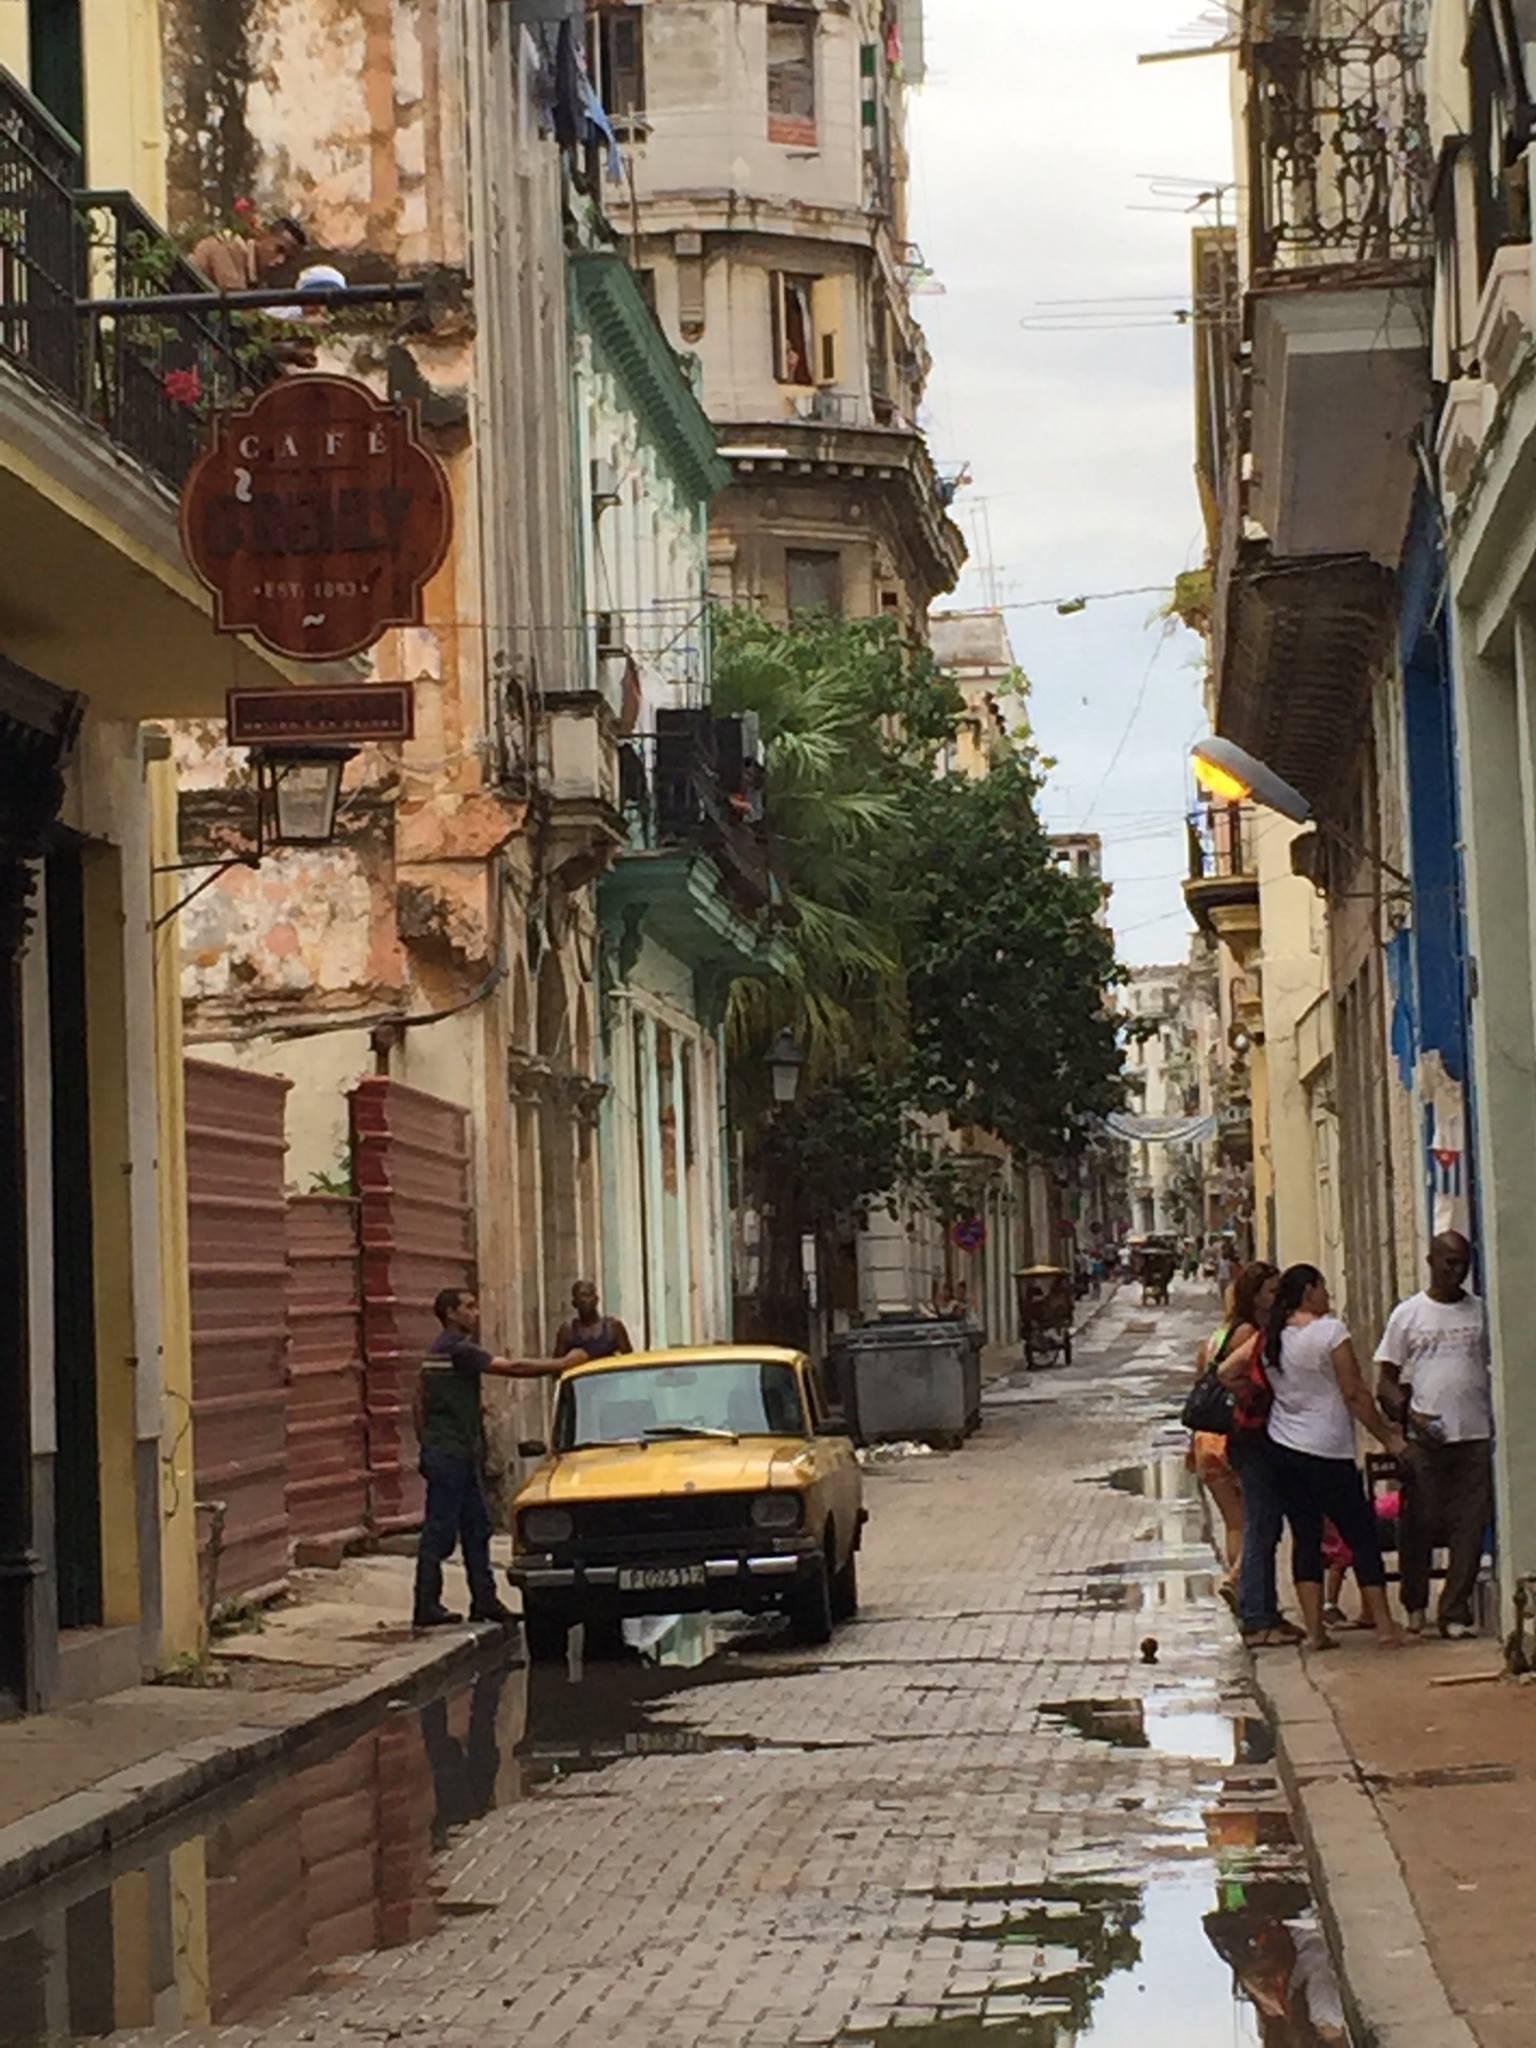 havana-cuba-alley.jpg